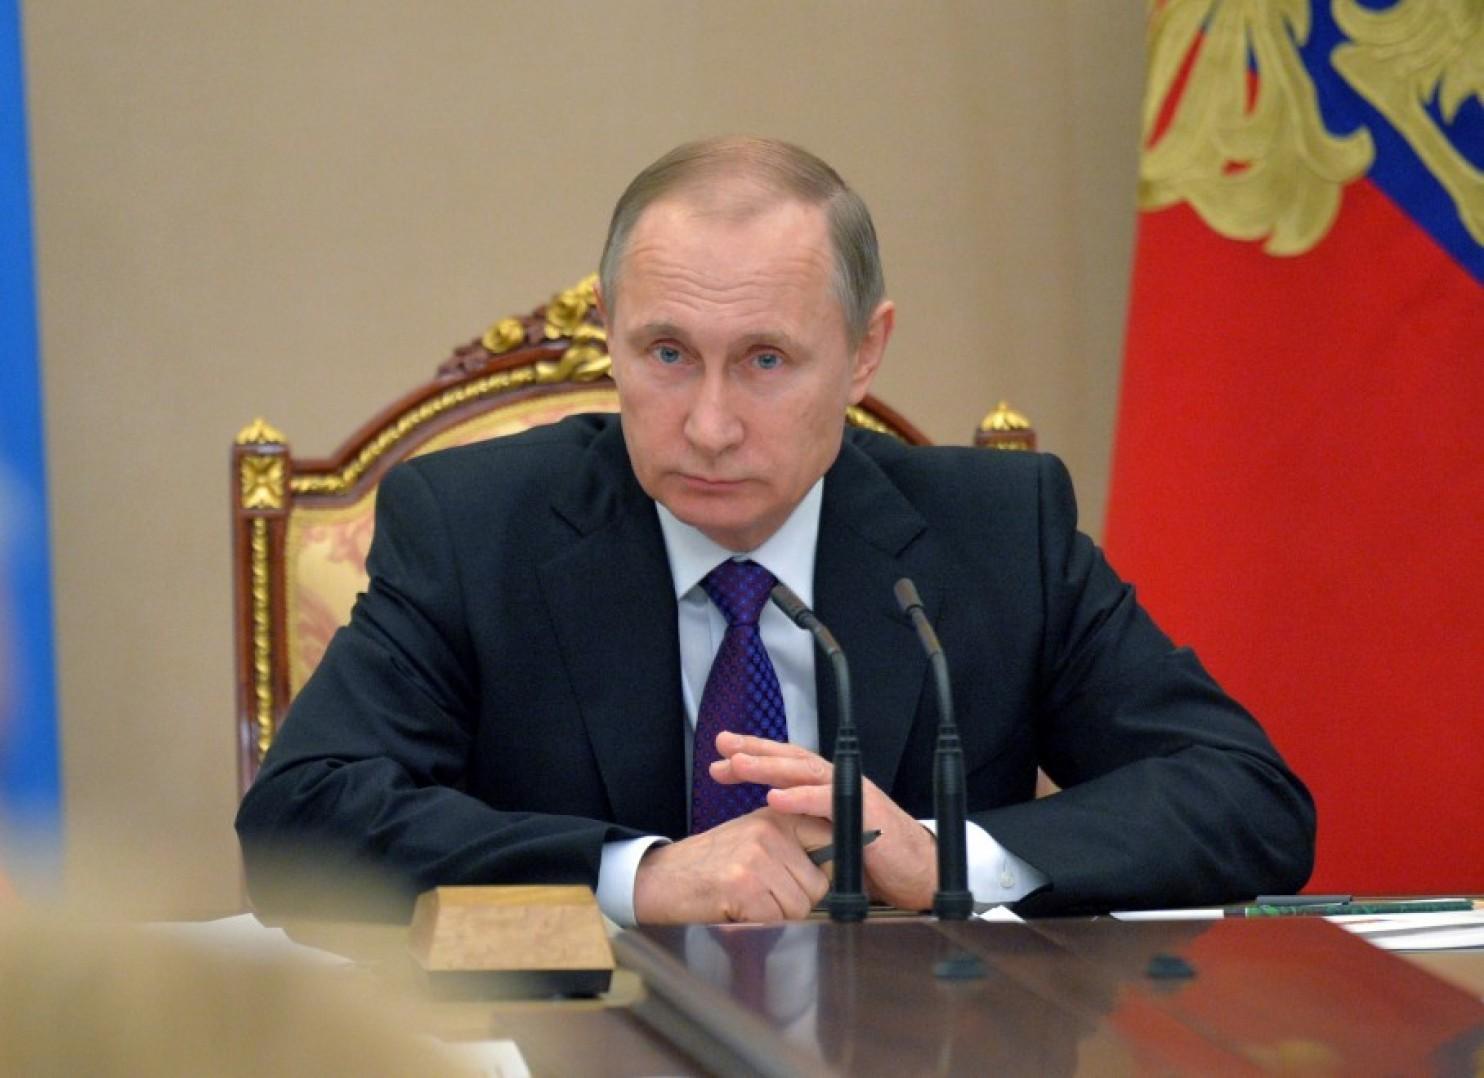 Russian President Vladimir Putin meets with the Cabinet in Moscow last month. (Alexei Druzhinin/Sputnik, Kremlin Pool Photo via Associated Press)